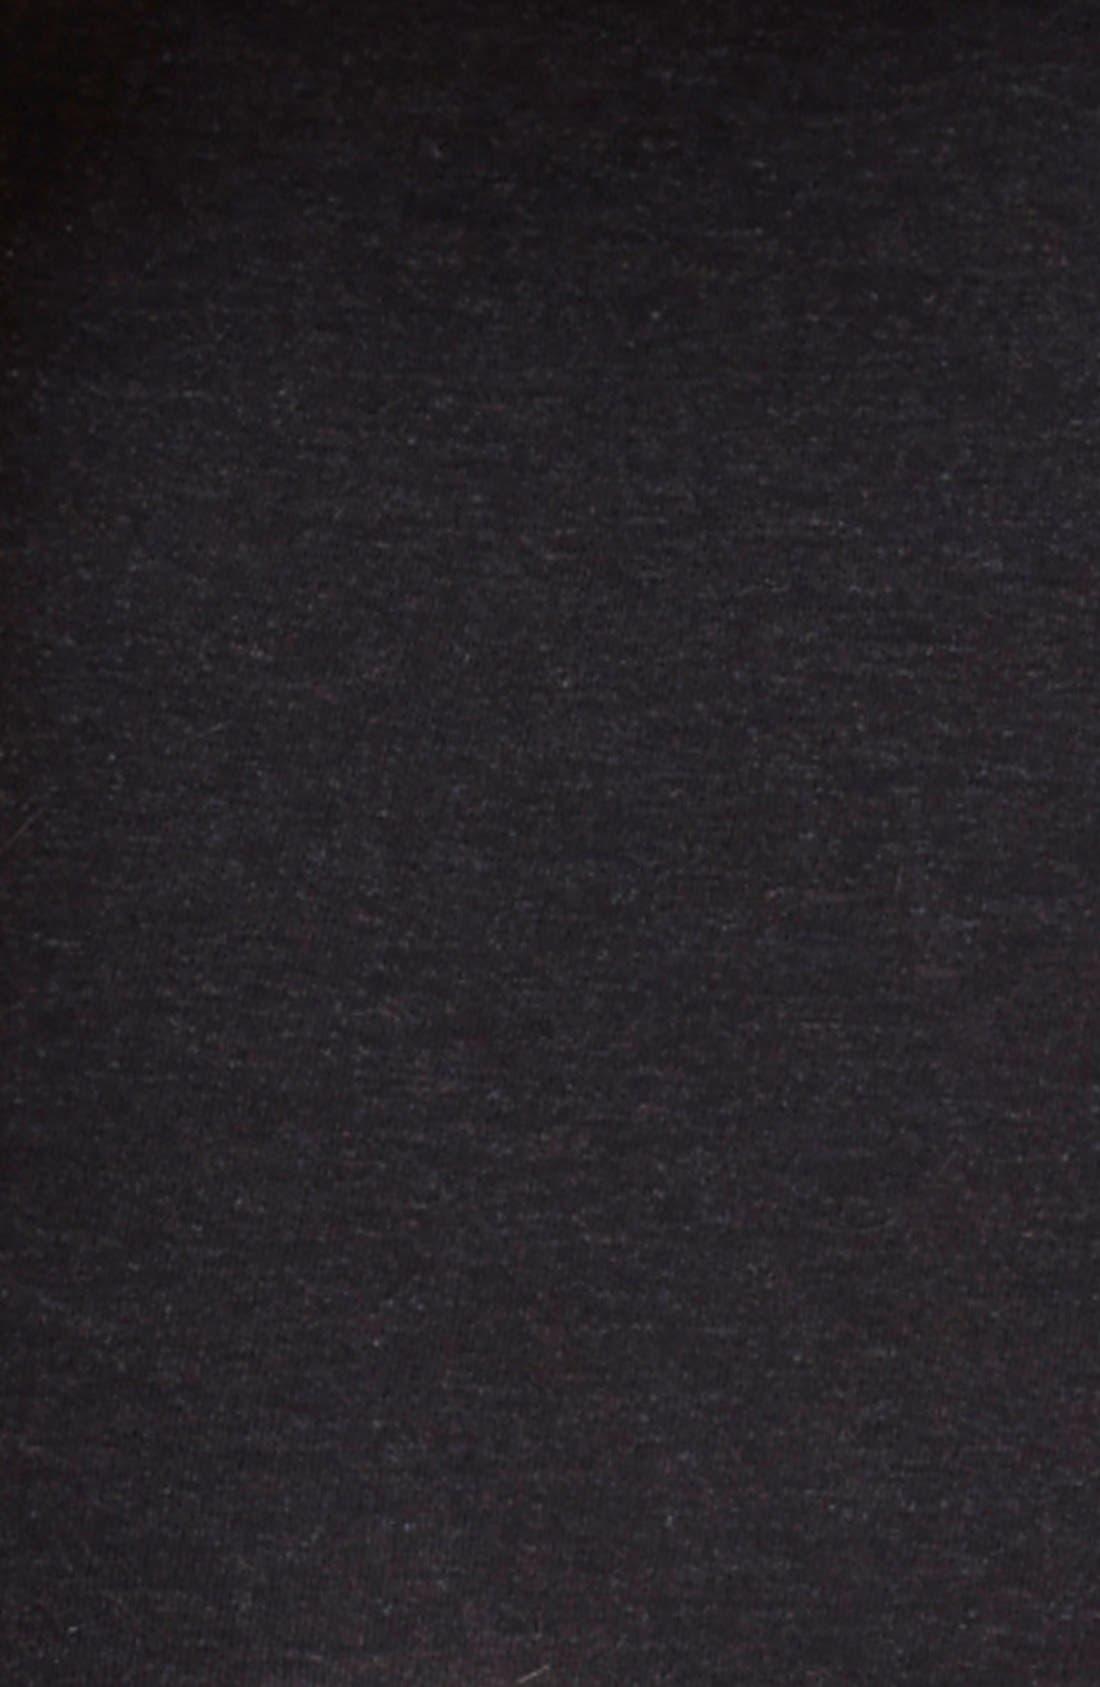 Alternate Image 3  - Lanvin Peplum Waist Neoprene Dress